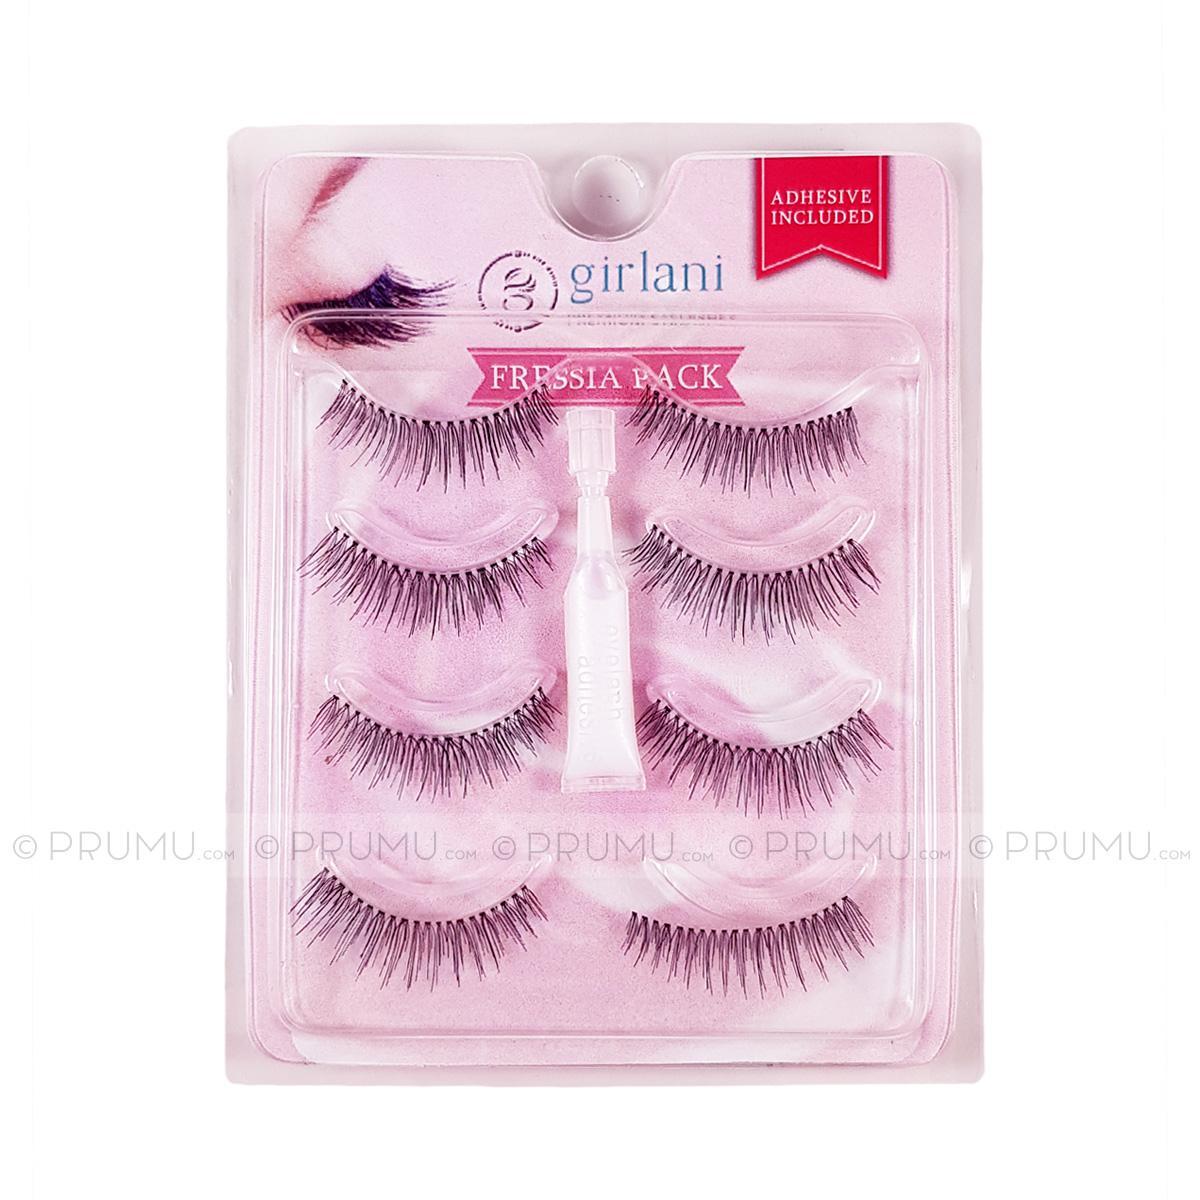 Fleur Lash Premium Eyelashes Bulu Mata Palsu Iris Daftar Harga Source · Bulu Mata Palsu Girlani Fressia Pack Premium False Eyelashes